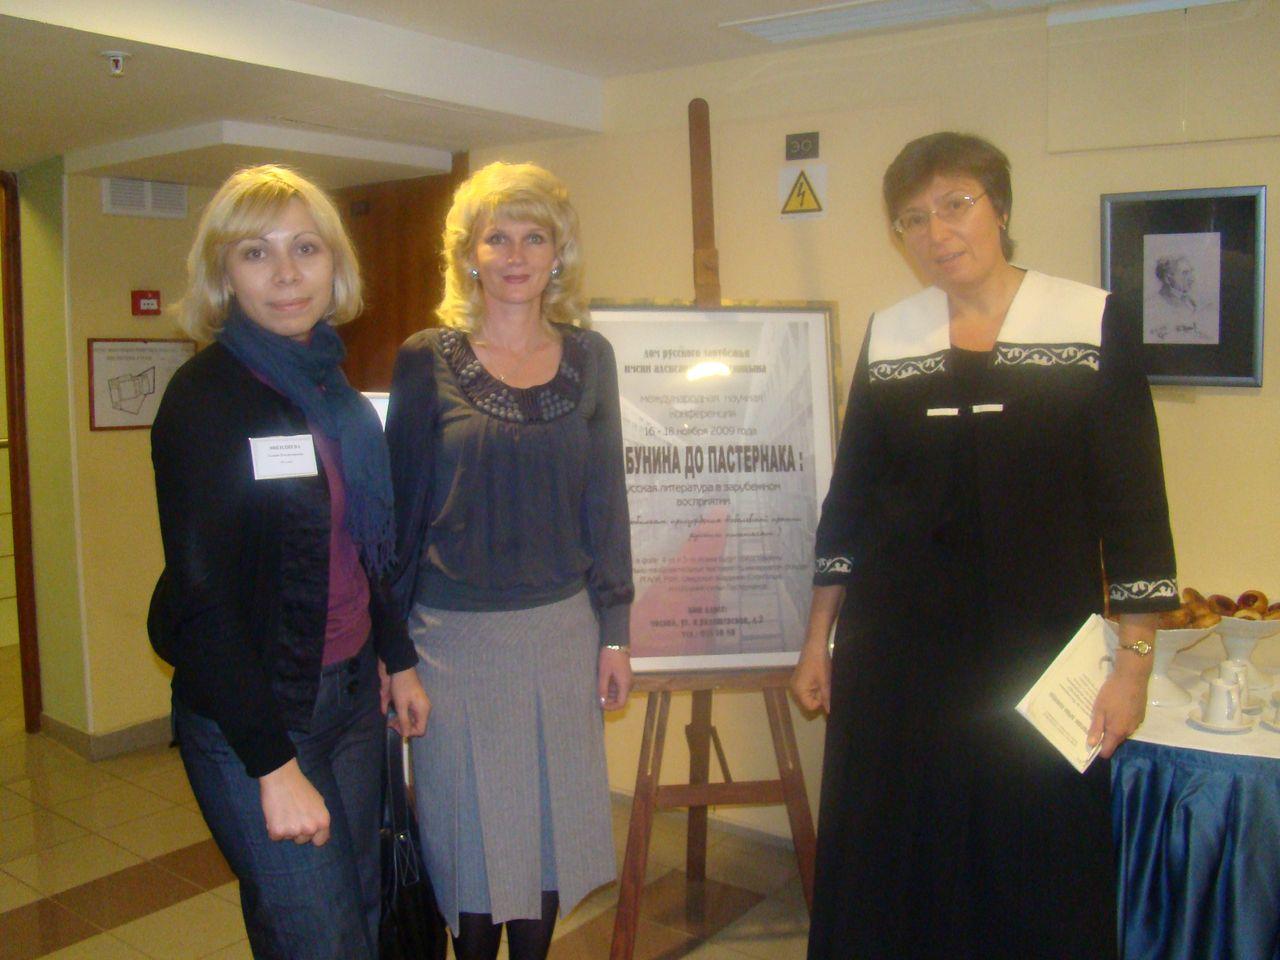 Дом русского Зарубежья. 2008